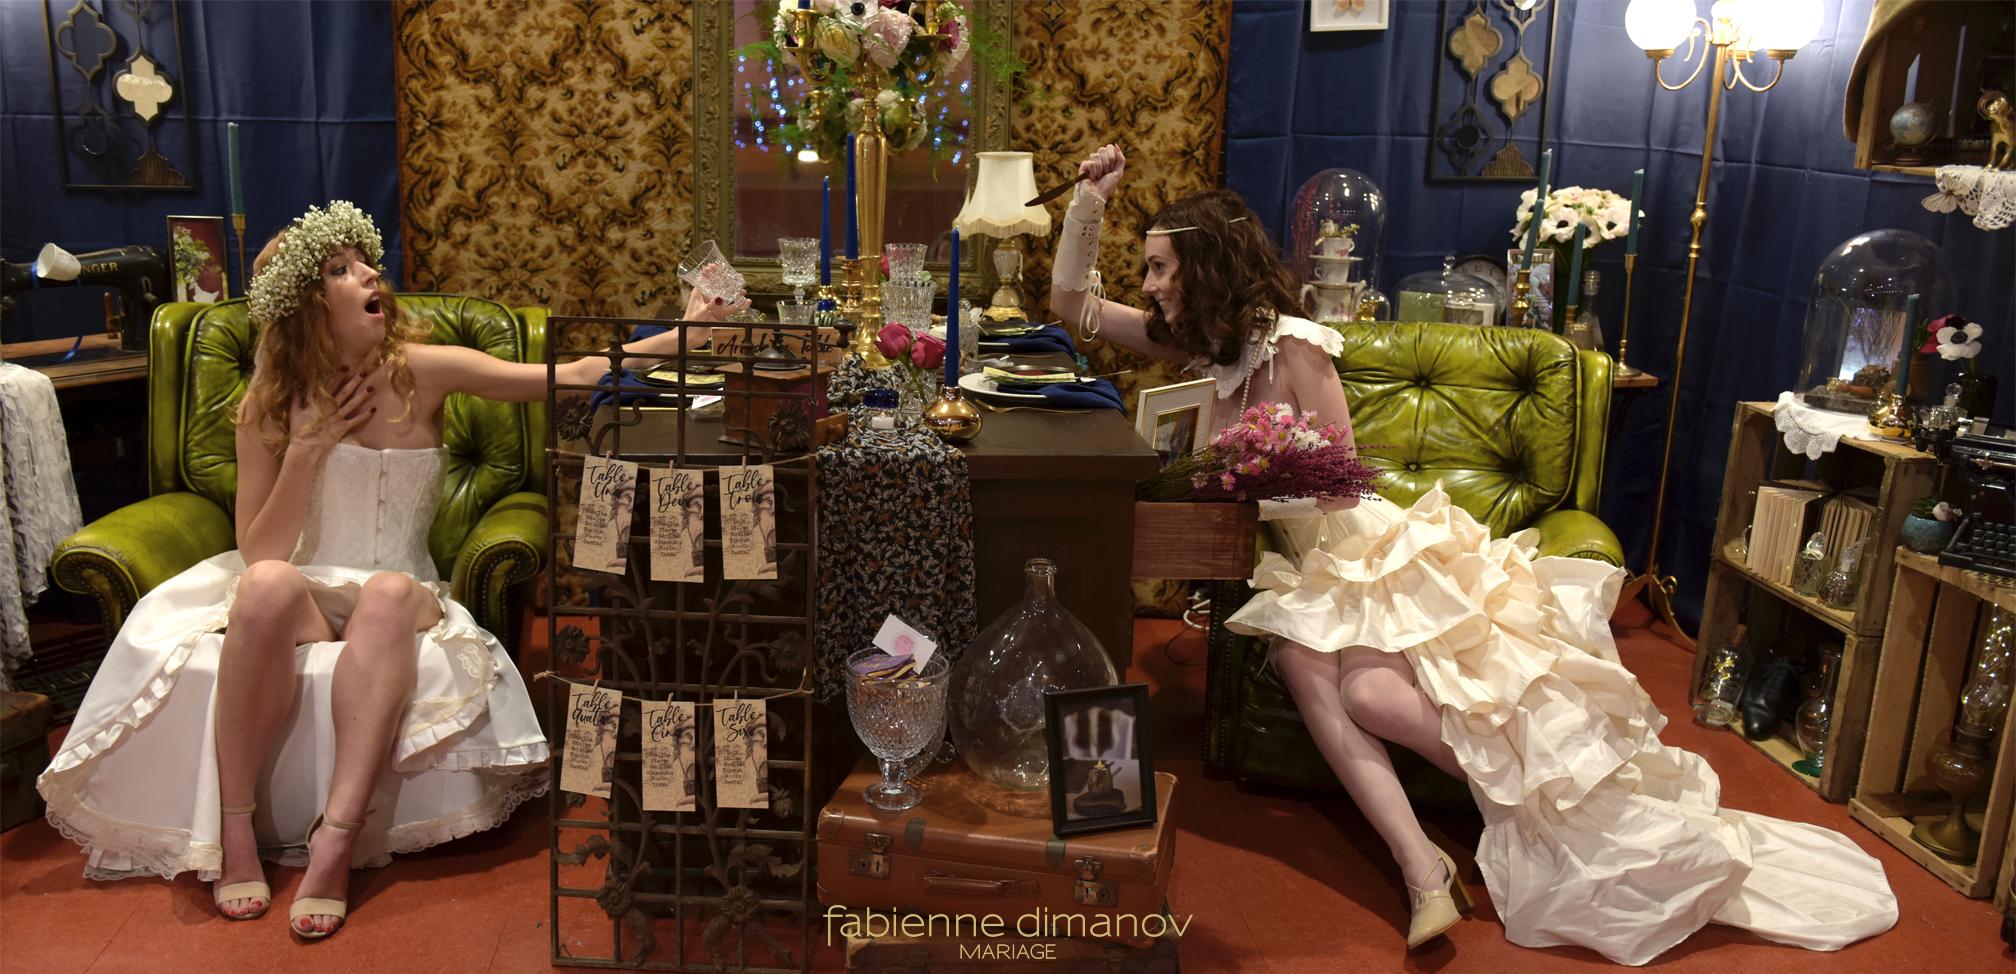 Cabinet des curiosités - Fabienne Dimanov Mariage